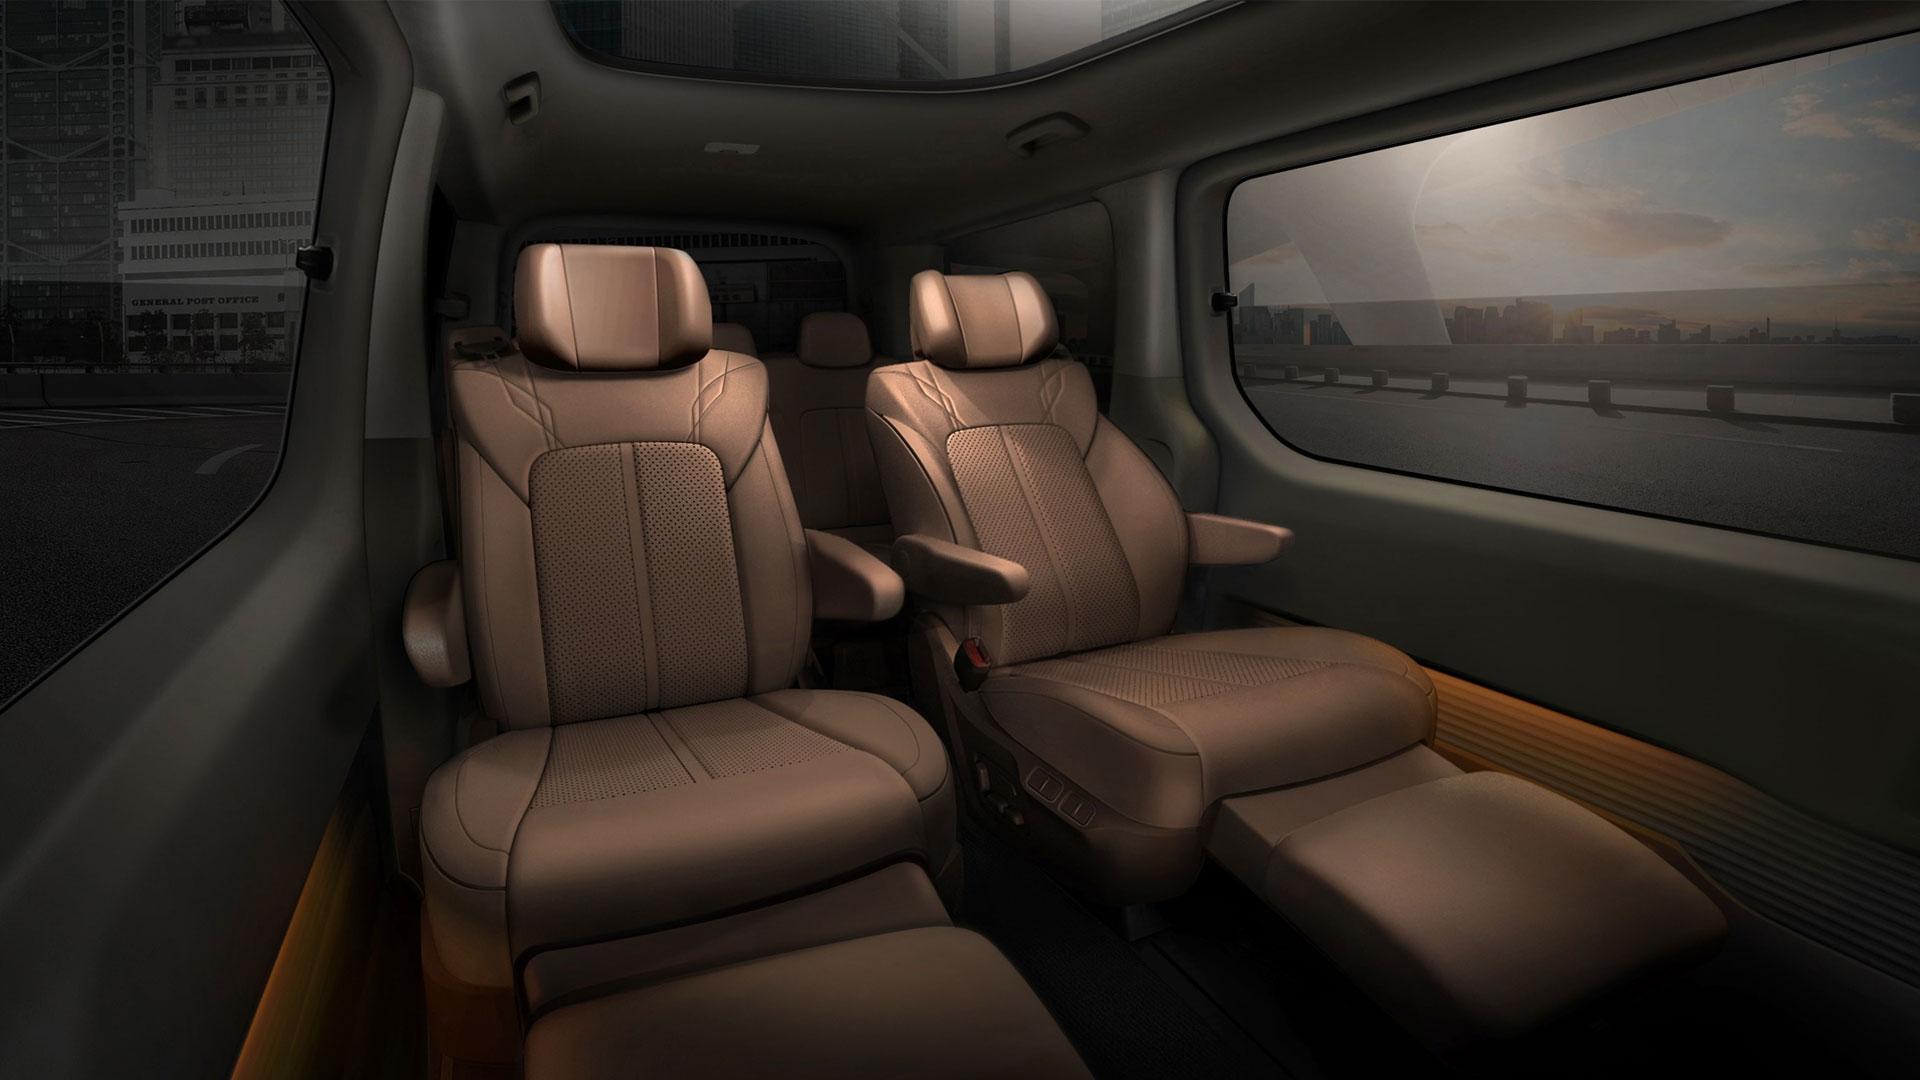 The Hyundai Staria rear passenger seats